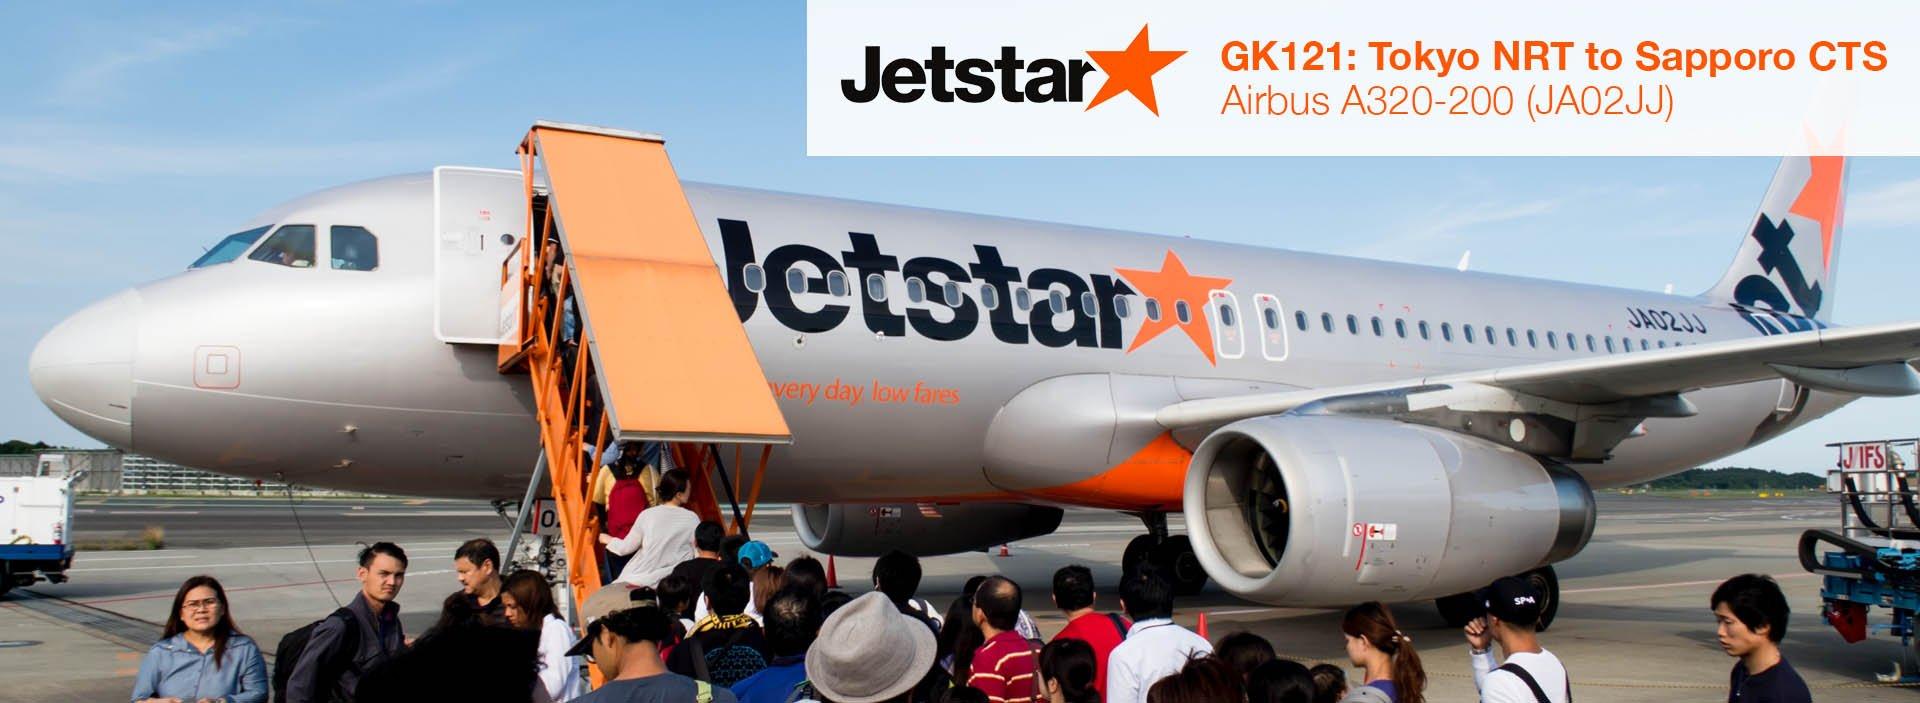 Jetstar Japan A320 Economy Class Tokyo NRT to Sapporo CTS Flight Review